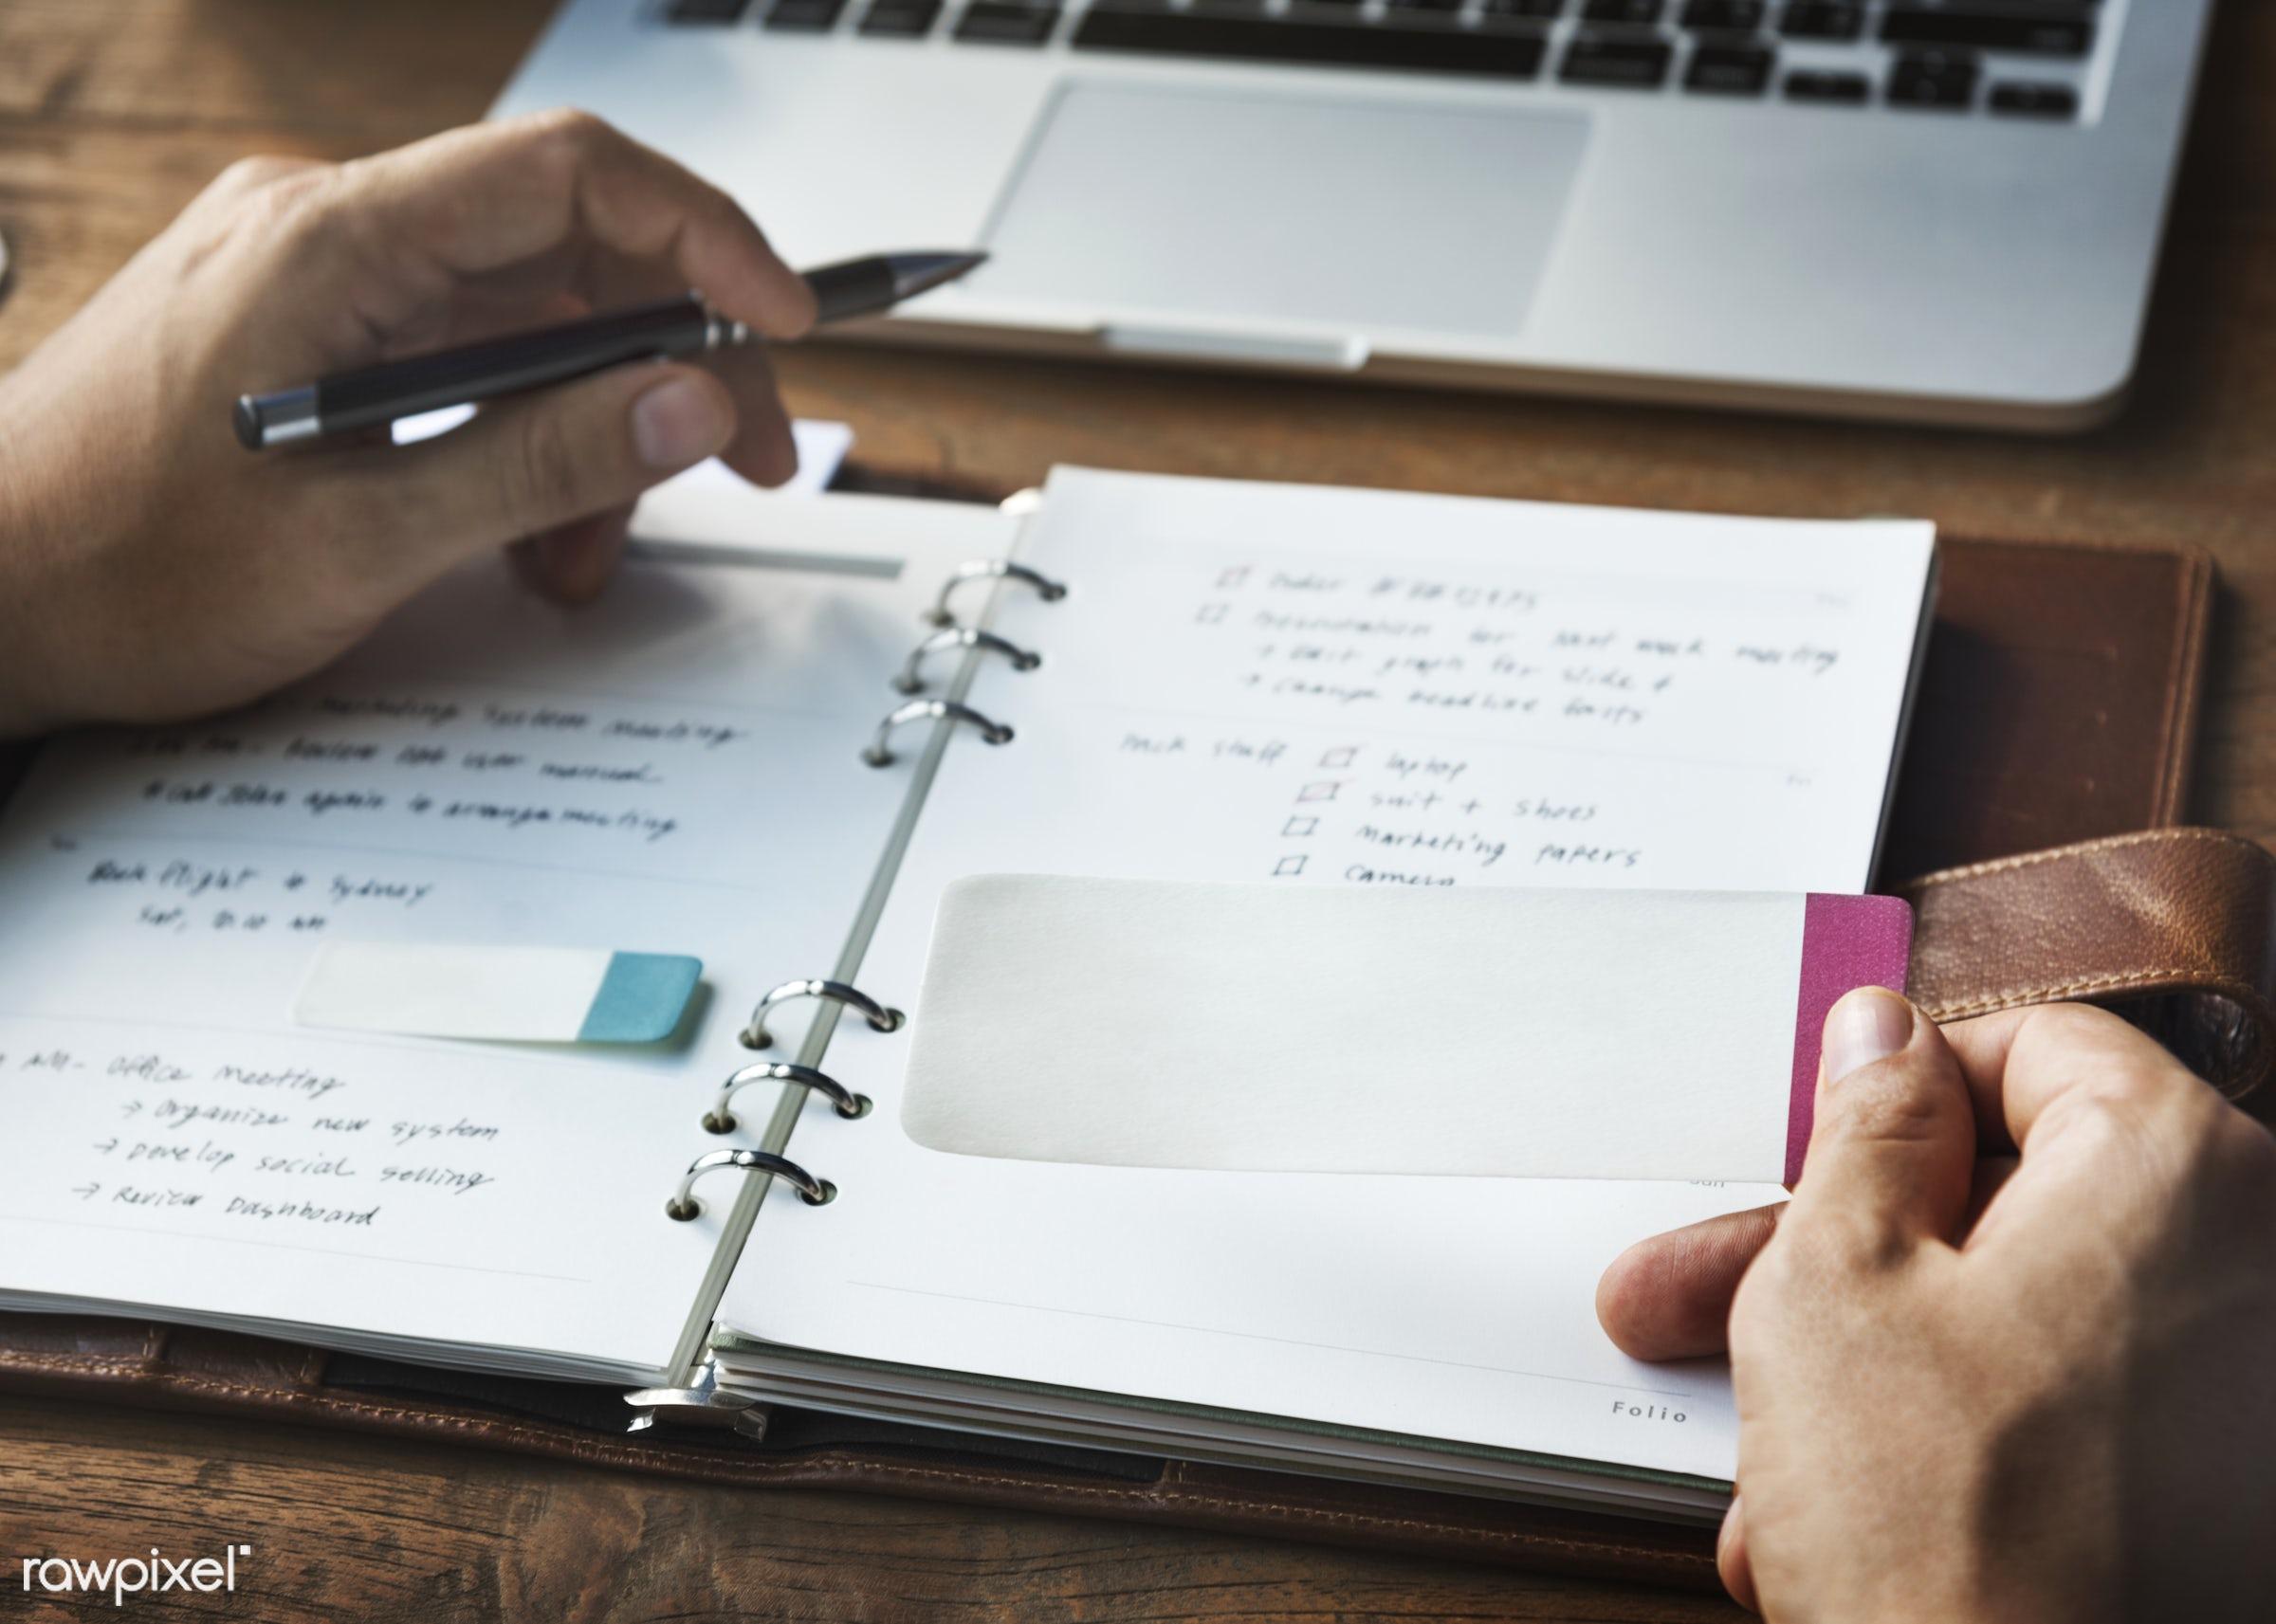 agenda, blank, book, business, businessman, cooperation, data, desk, diary, digital, empty, ideas, information, laptop,...